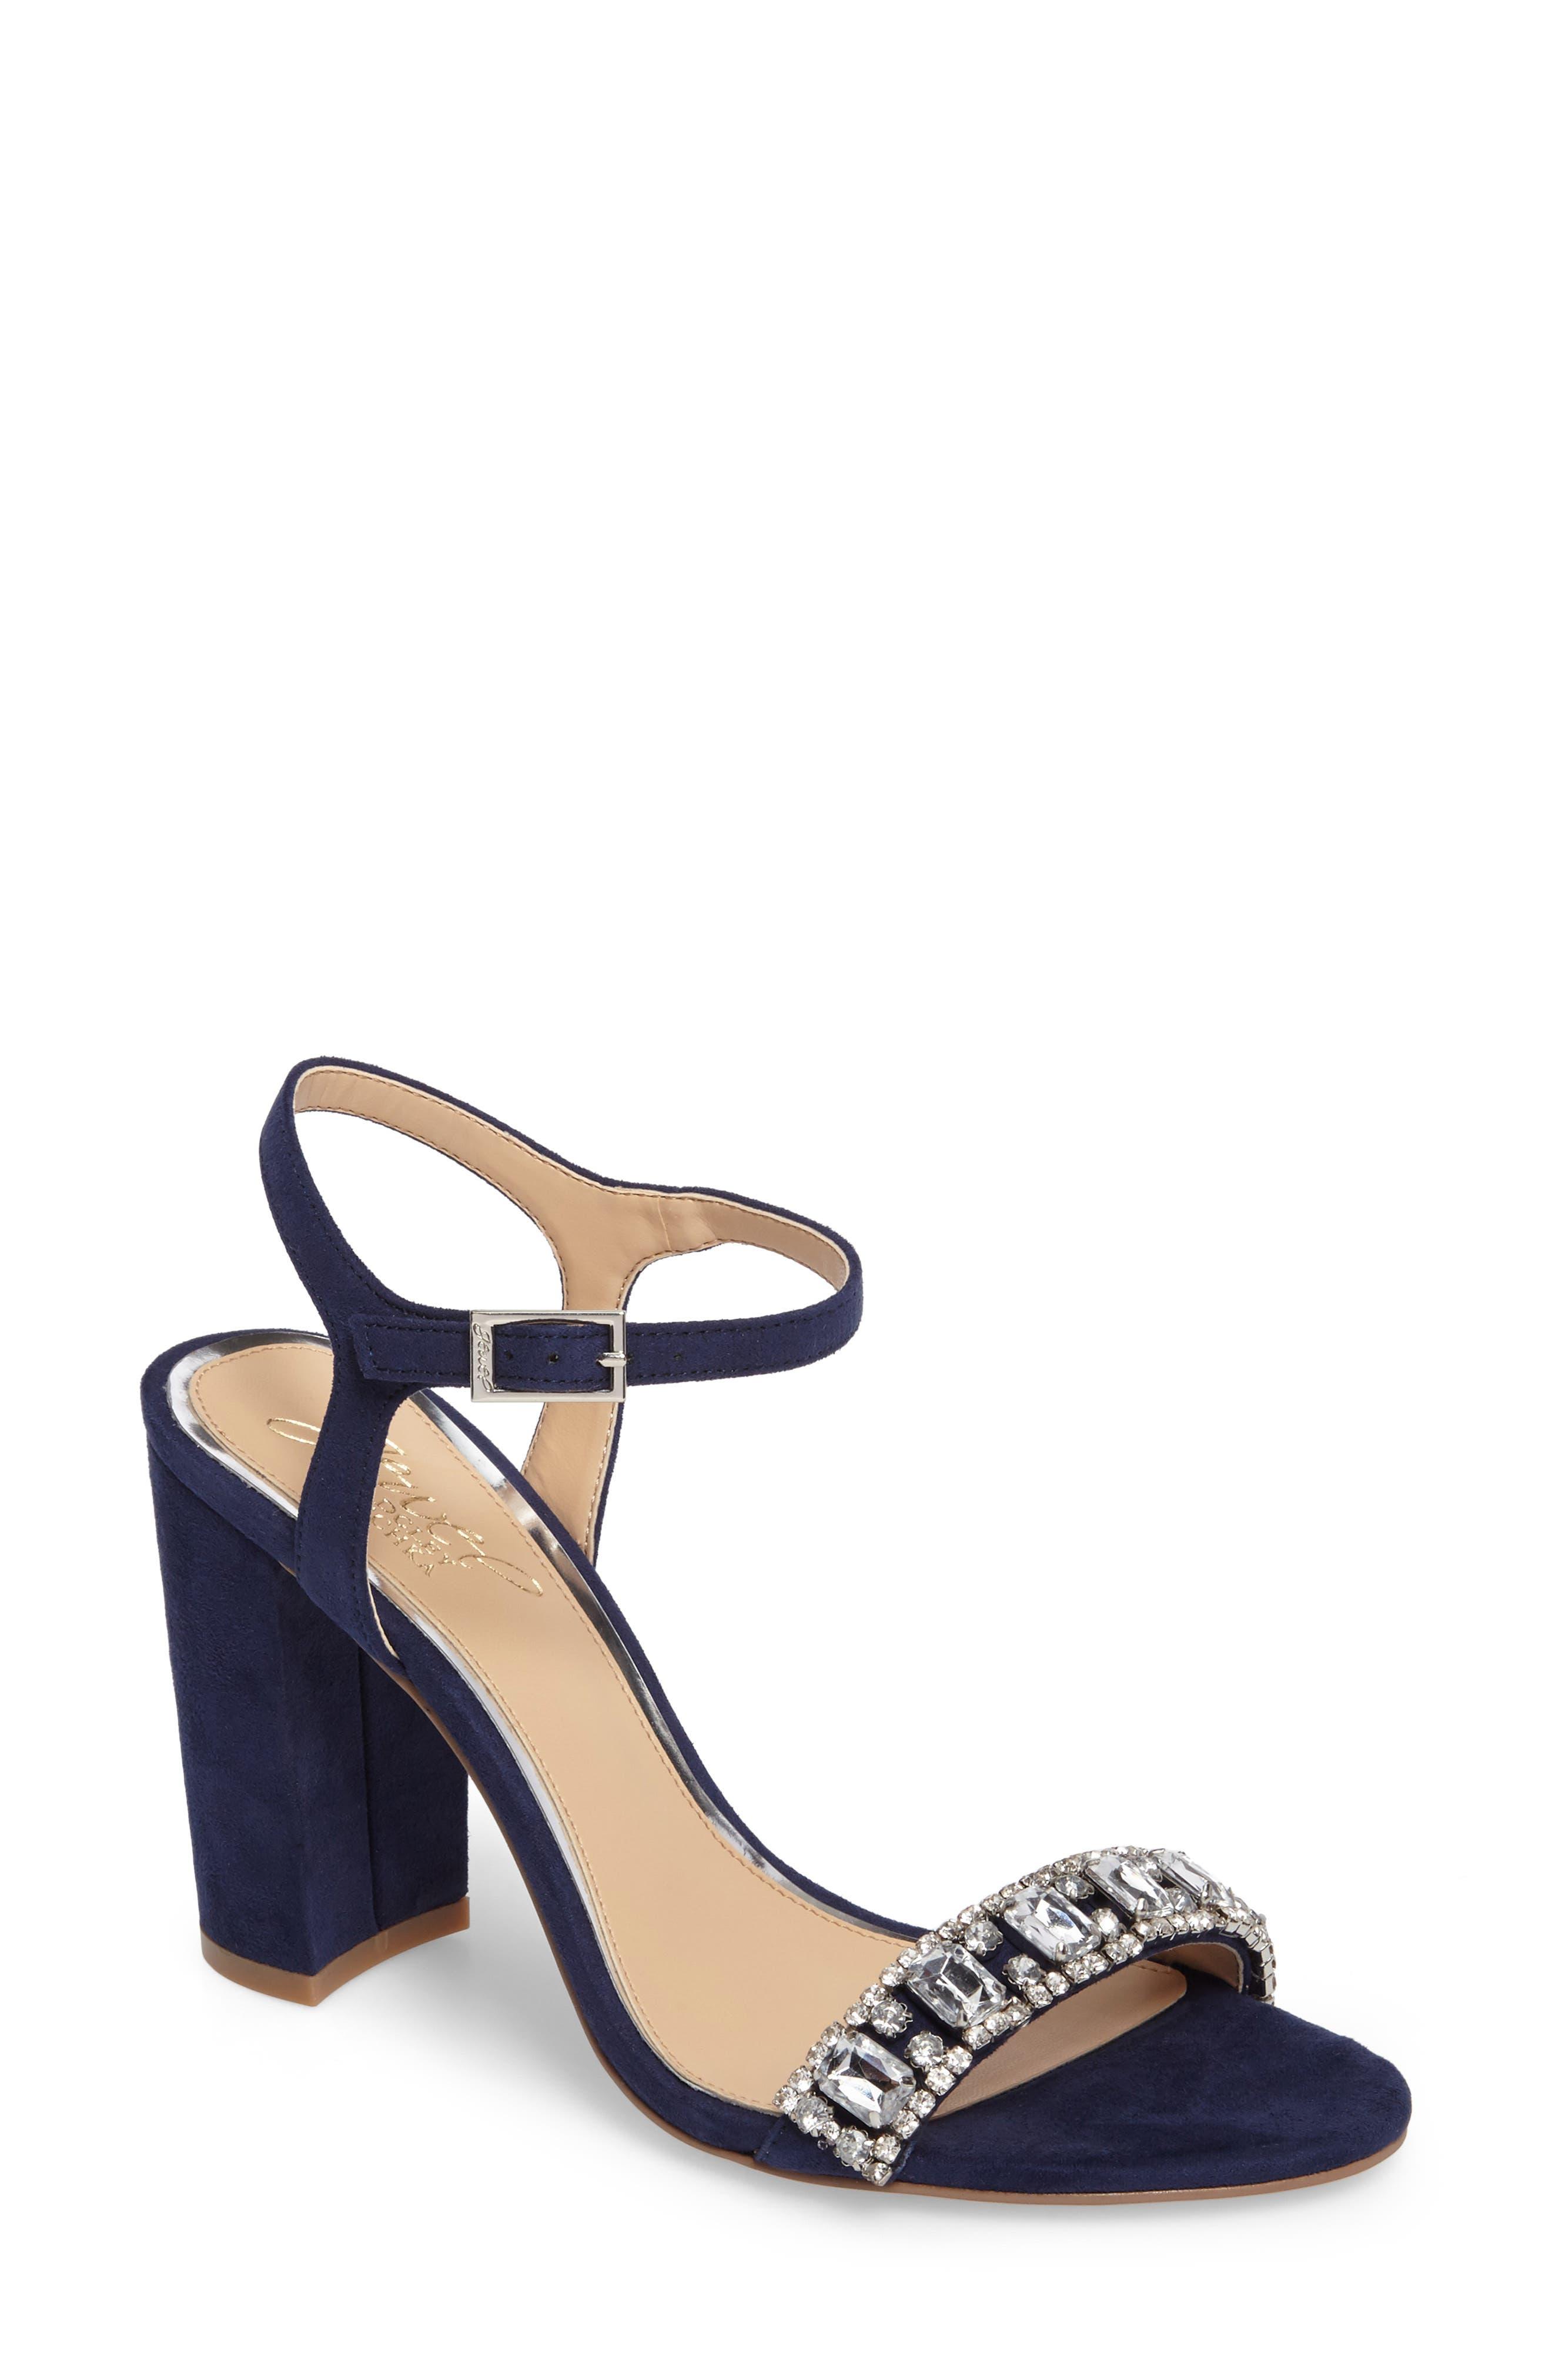 Hendricks Embellished Block Heel Sandal,                             Main thumbnail 1, color,                             Navy Suede